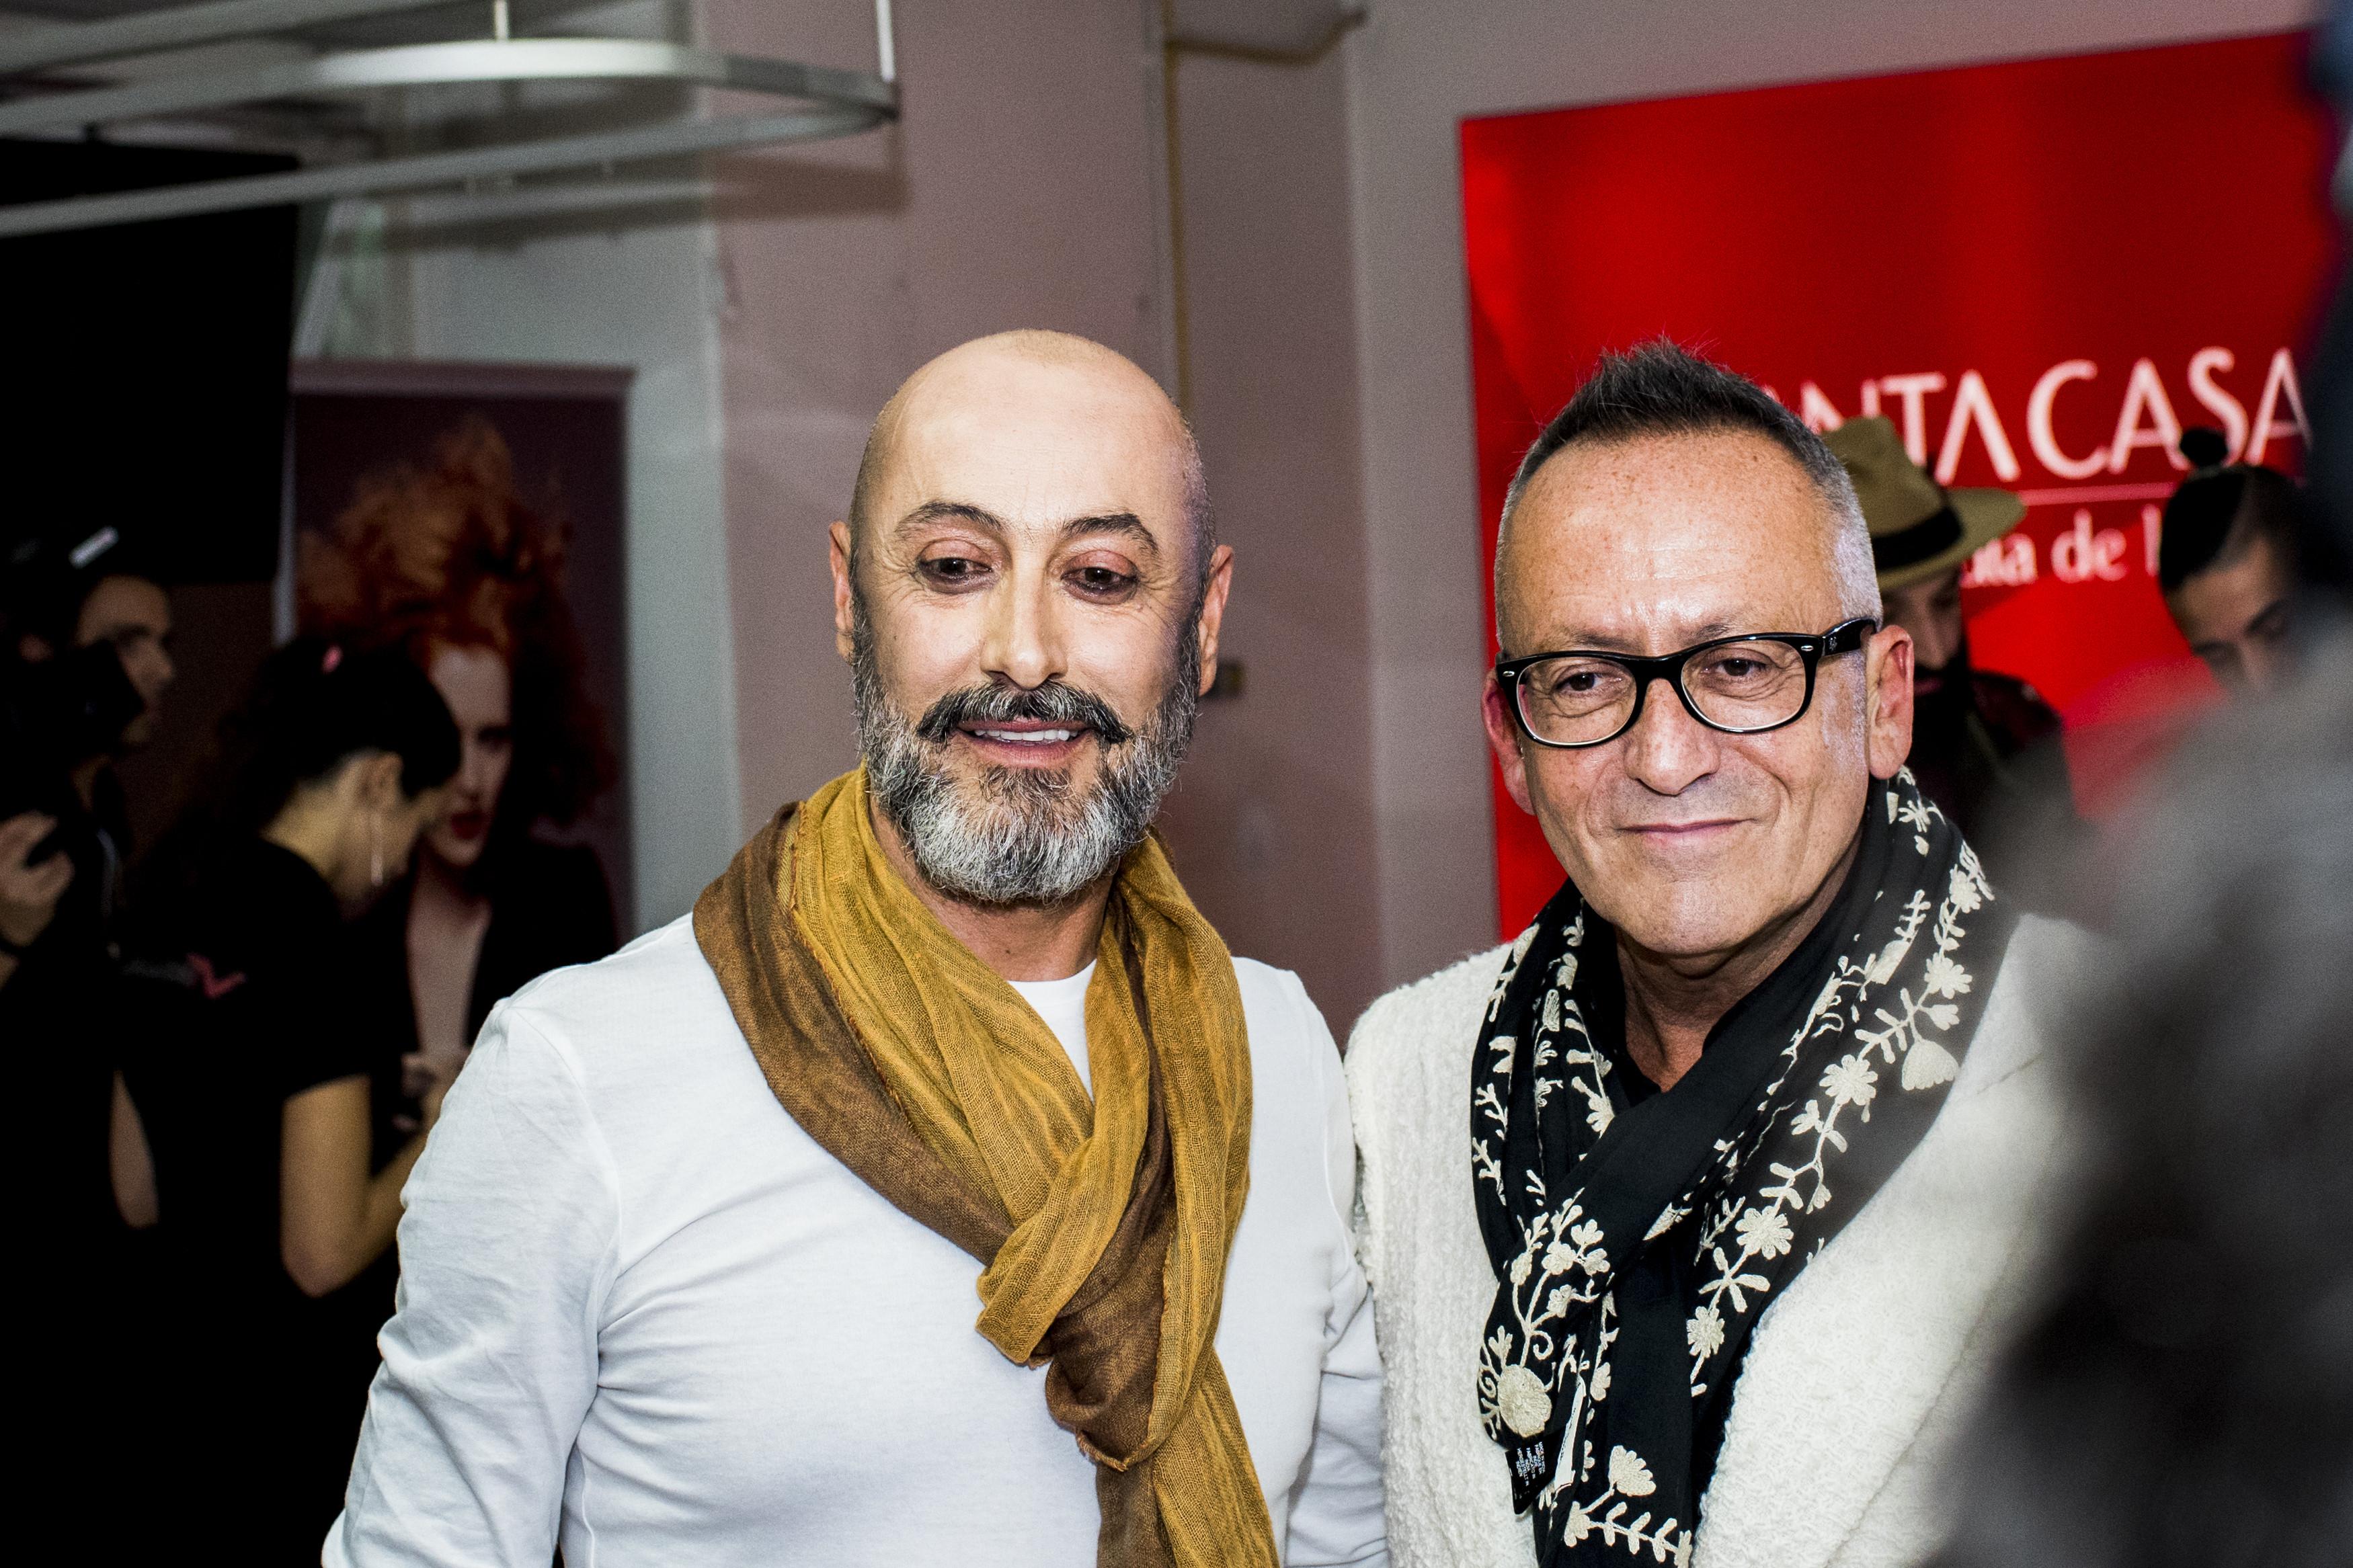 Manuel Luís Goucha apresenta novo elemento da família: A pequena Bolota